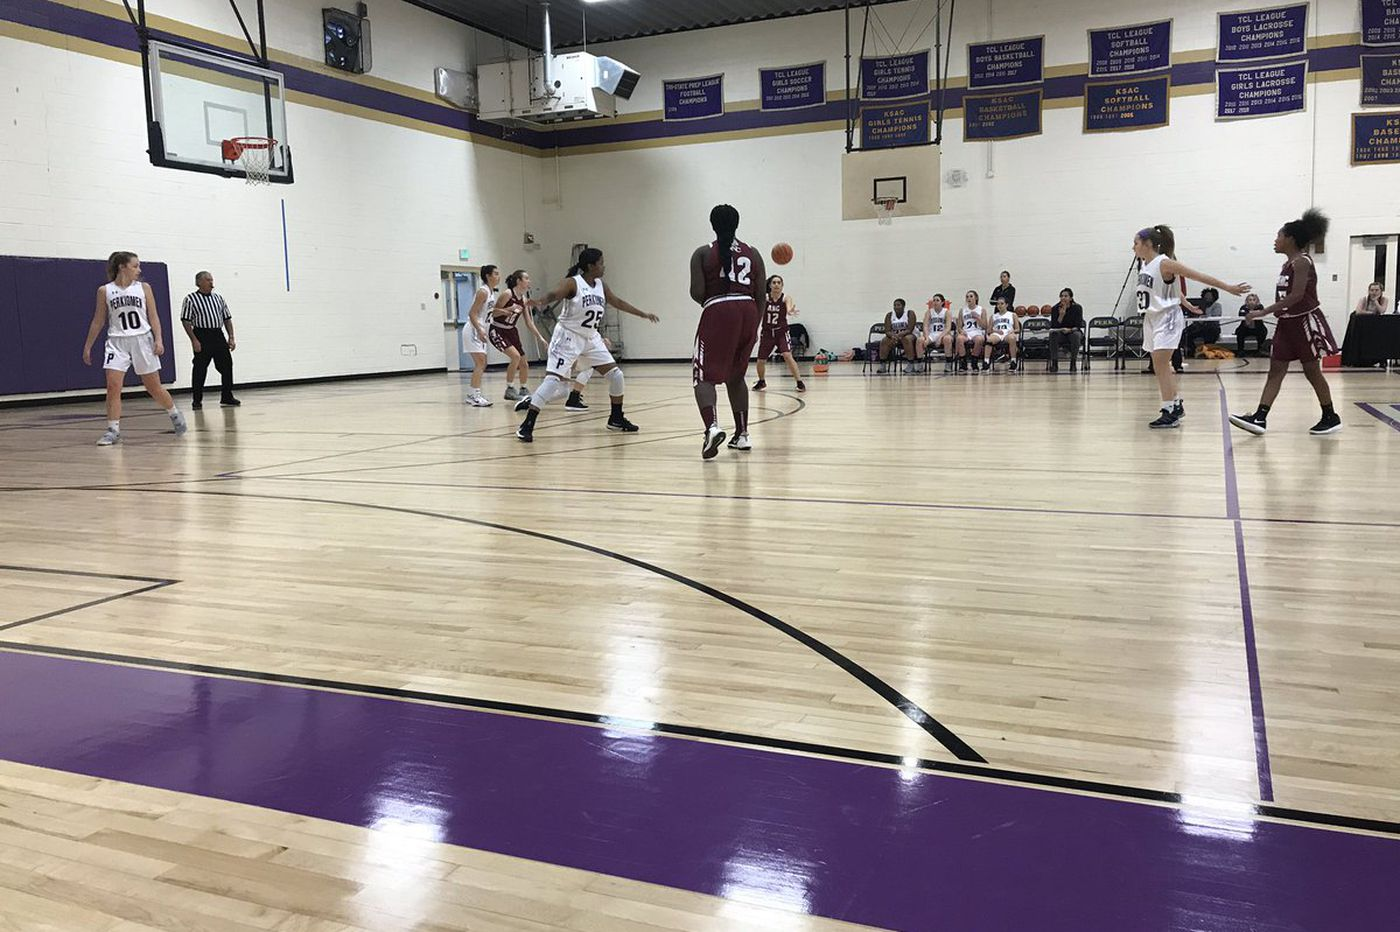 Thursday's Southeastern Pa. roundup: Perkiomen School girls' basketball rolls past Academy of New Church